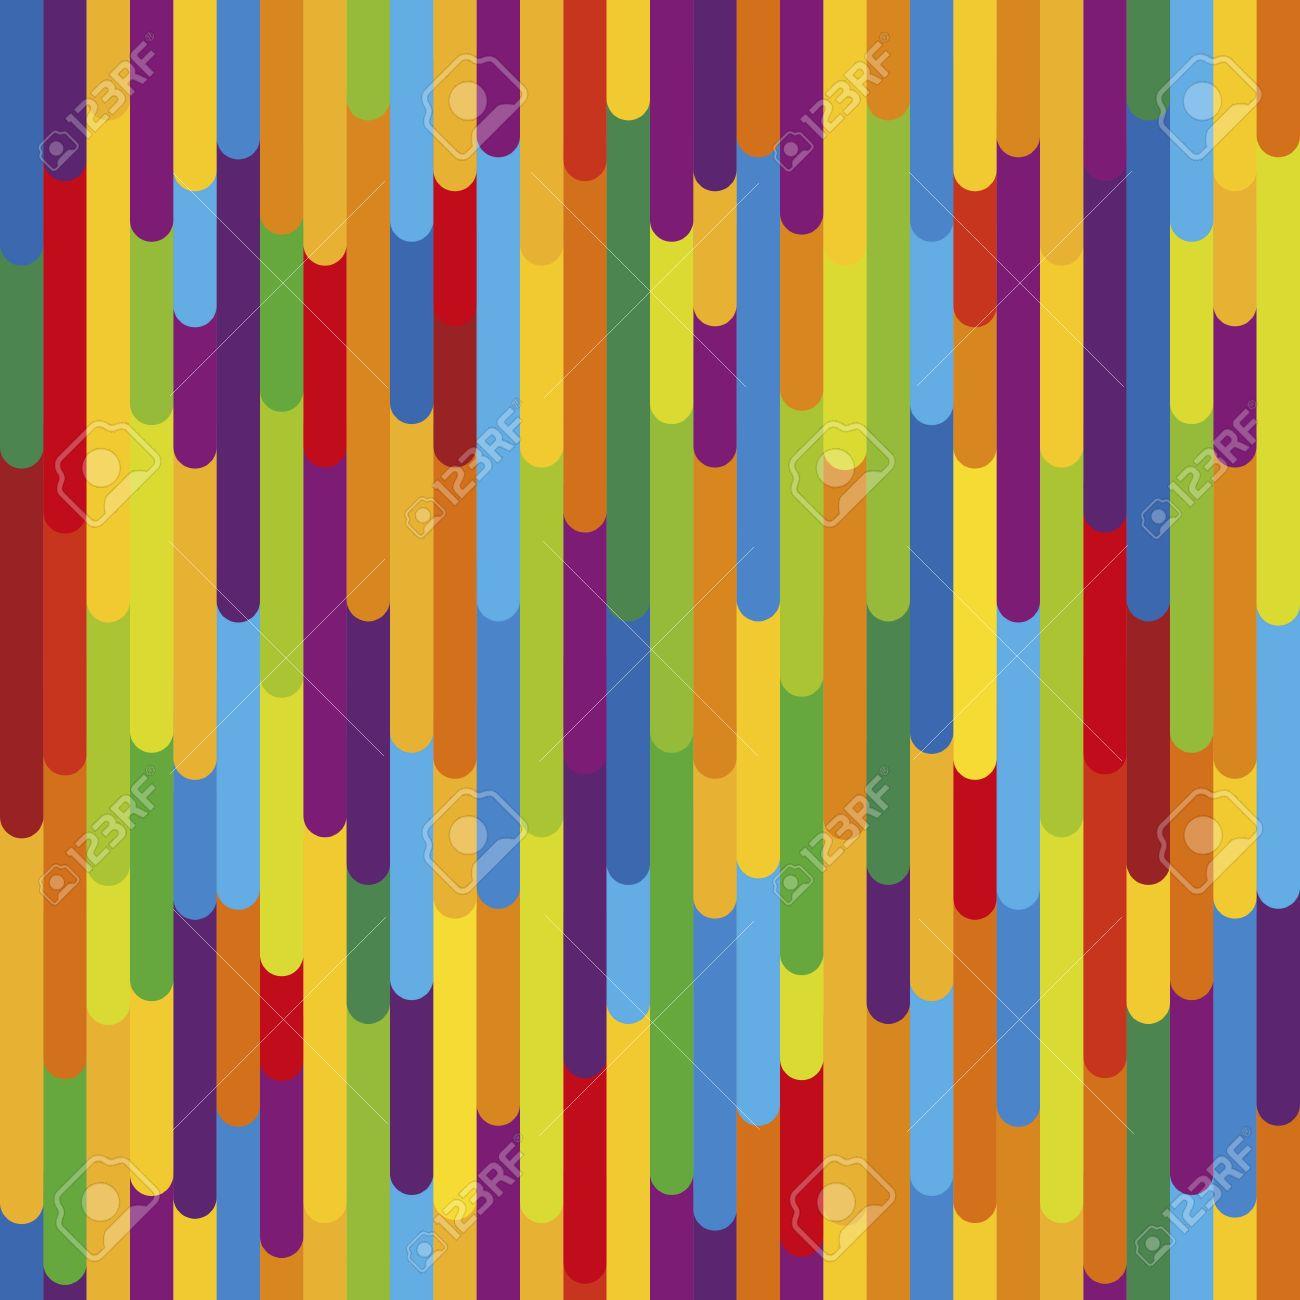 Rayas Verticales Textura De Colores De Fondo. Modelo Inconsútil Del ...